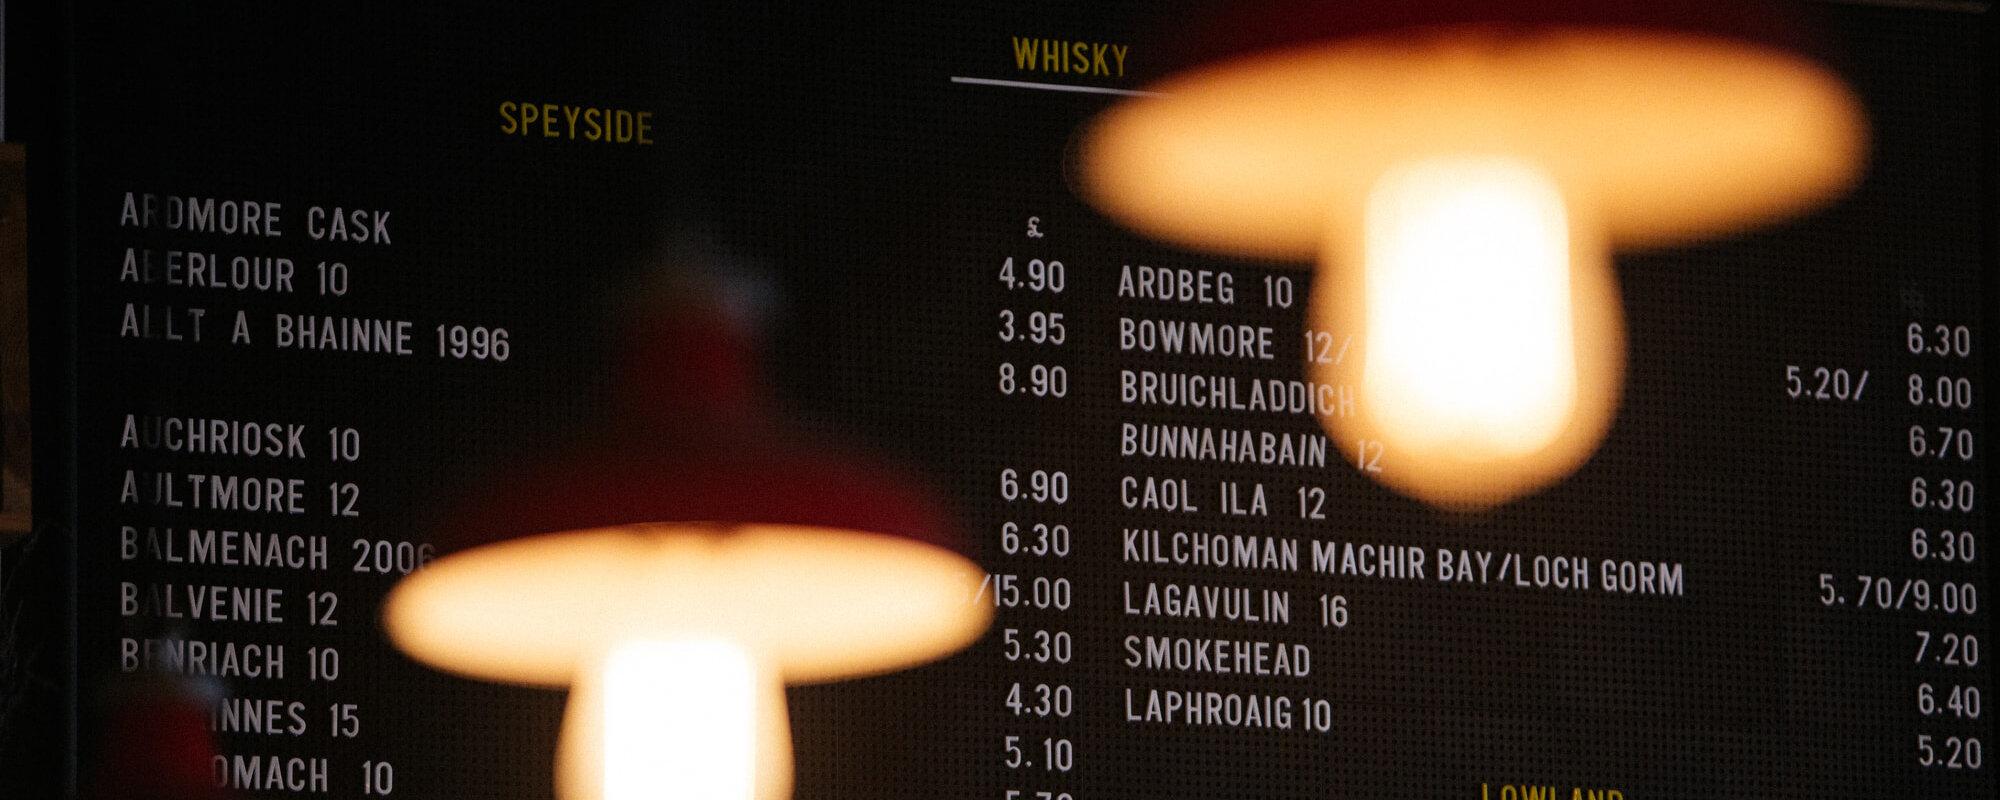 Whisky Selection.jpg